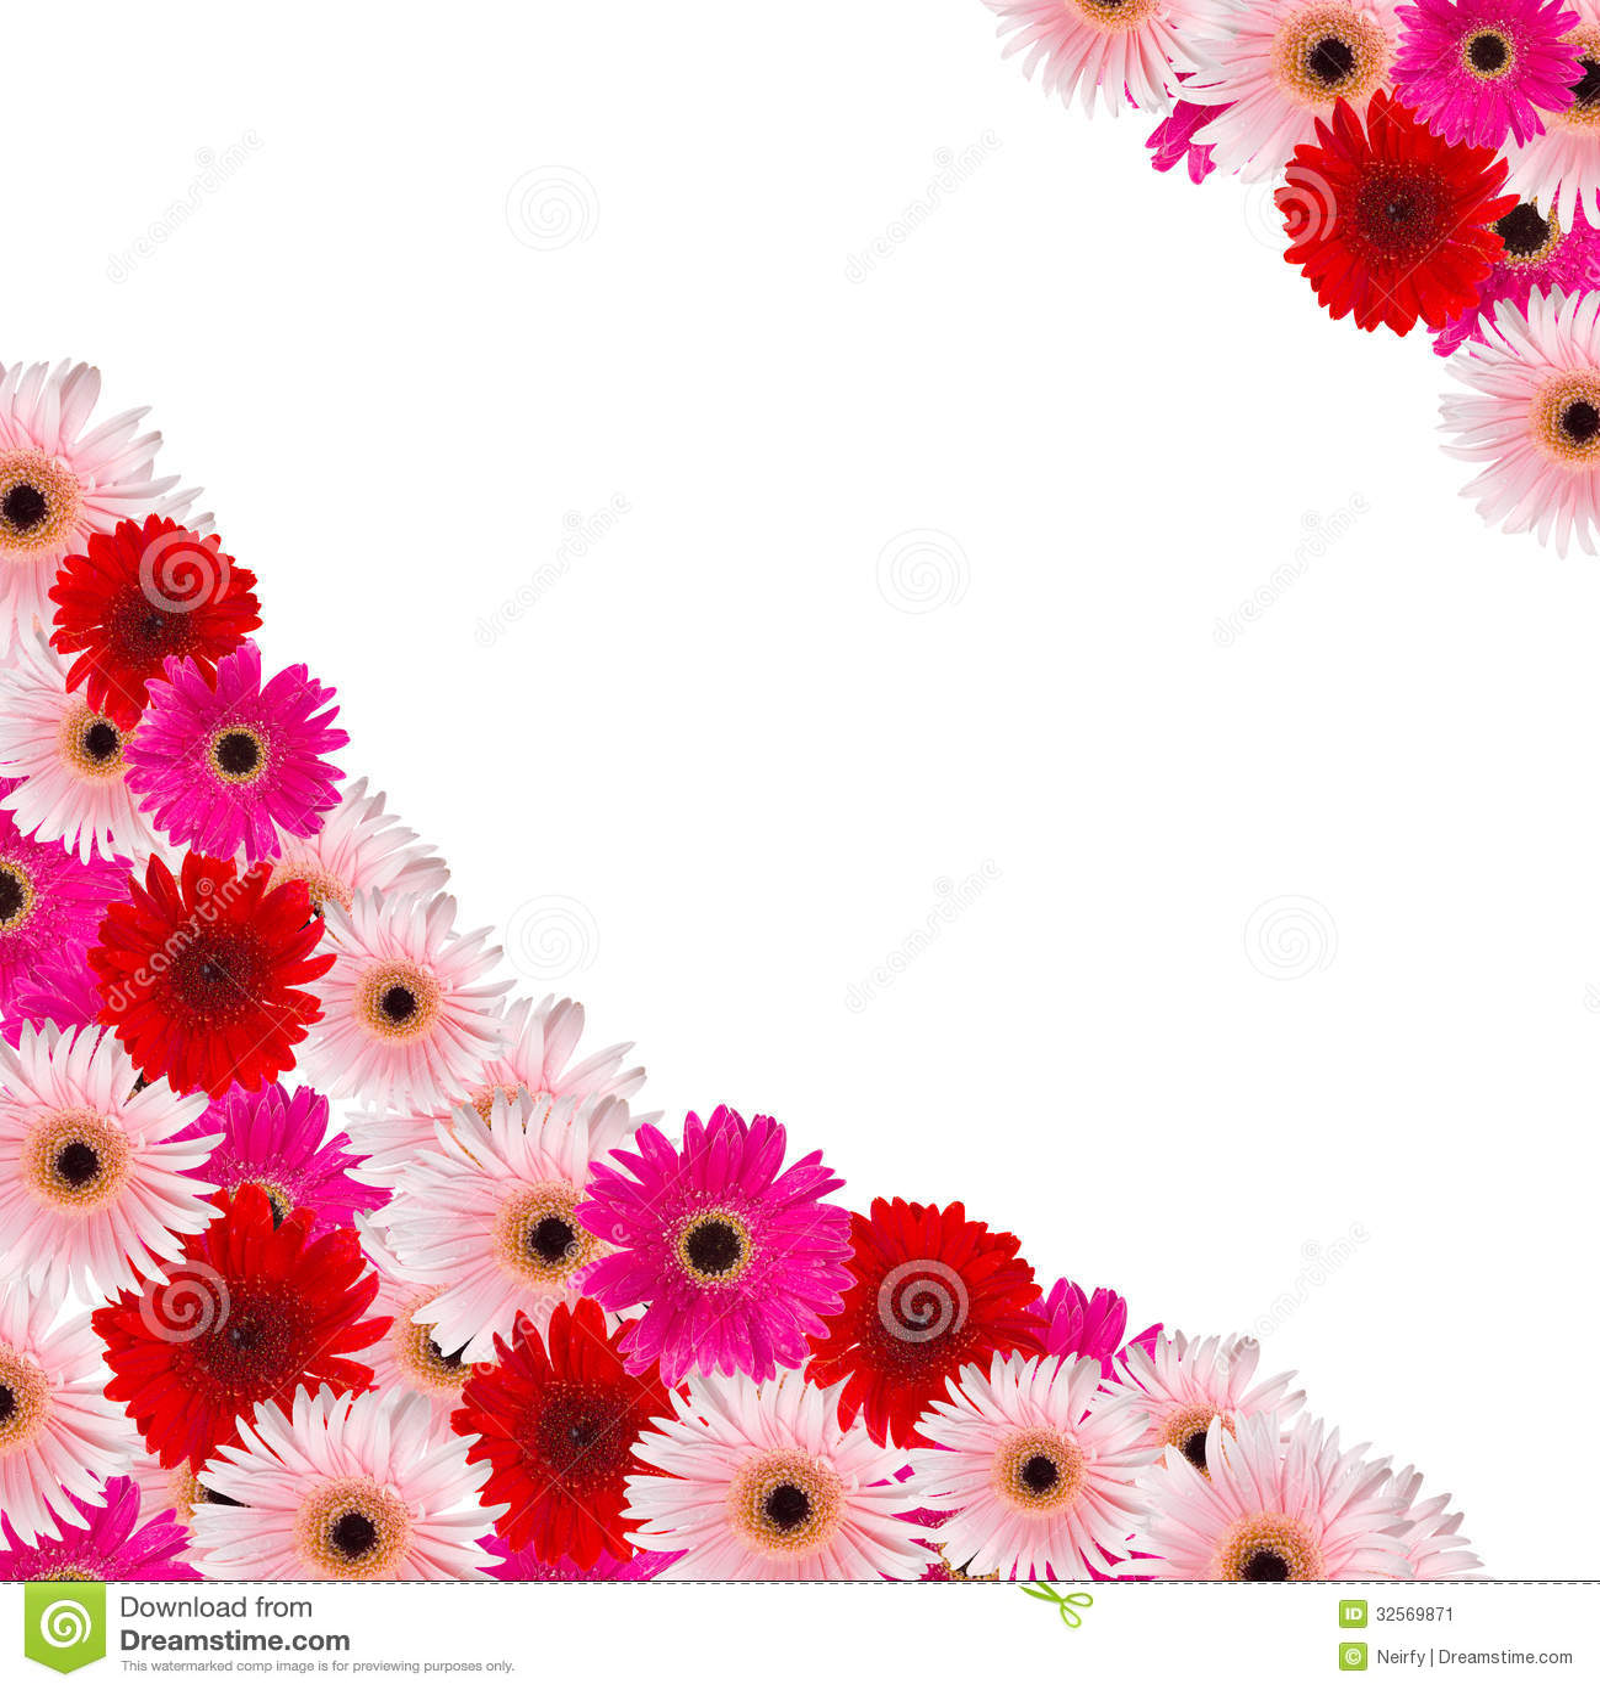 Pink and red herbera flowers border stock image image of bouquet pink and red herbera flowers border mightylinksfo